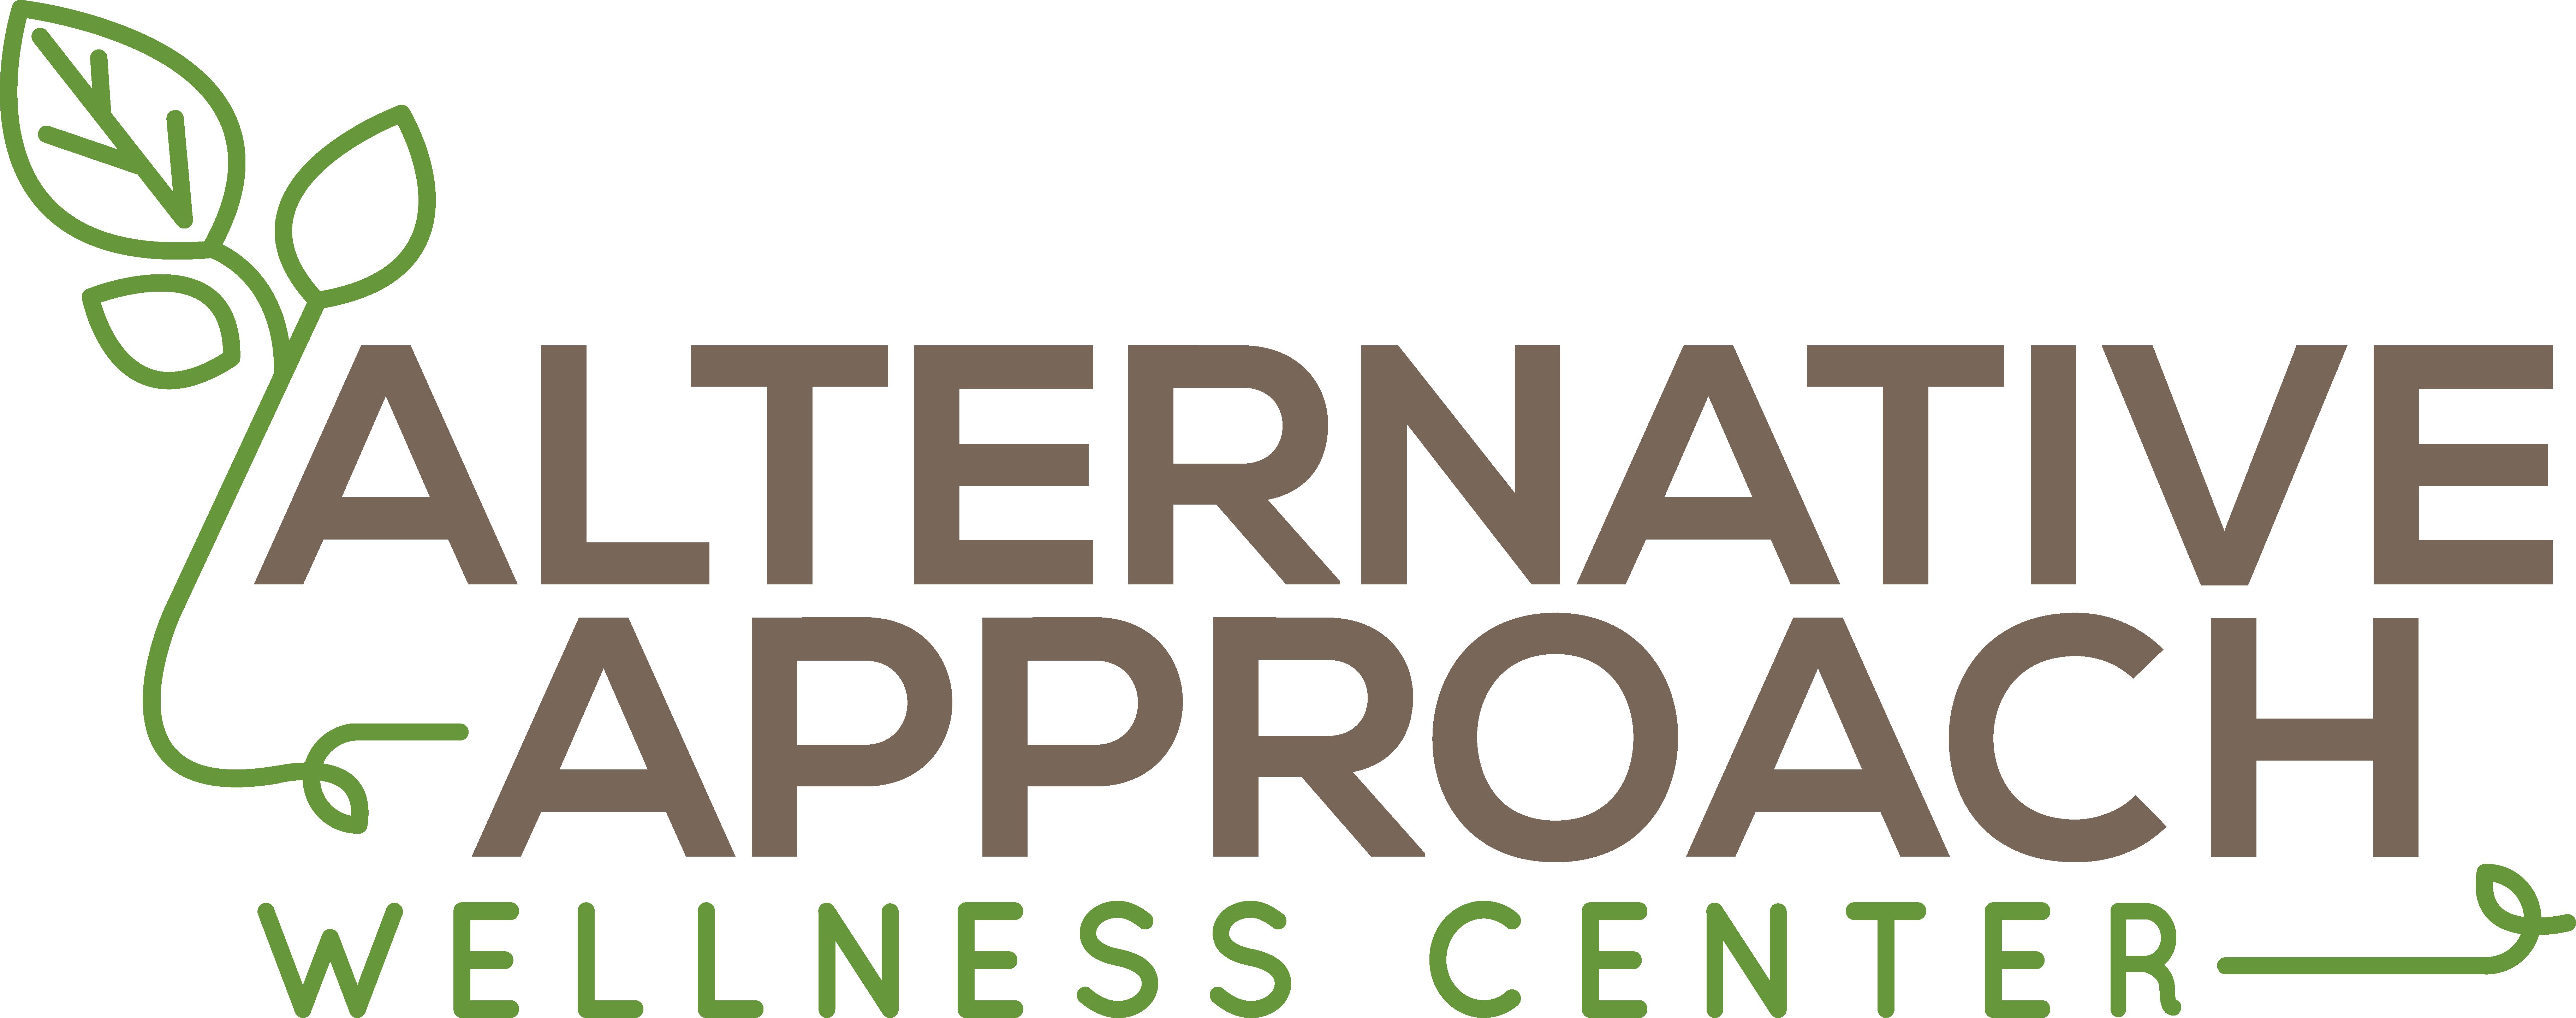 PEMF Cellular Exercise – Alternative Approach Wellness Center